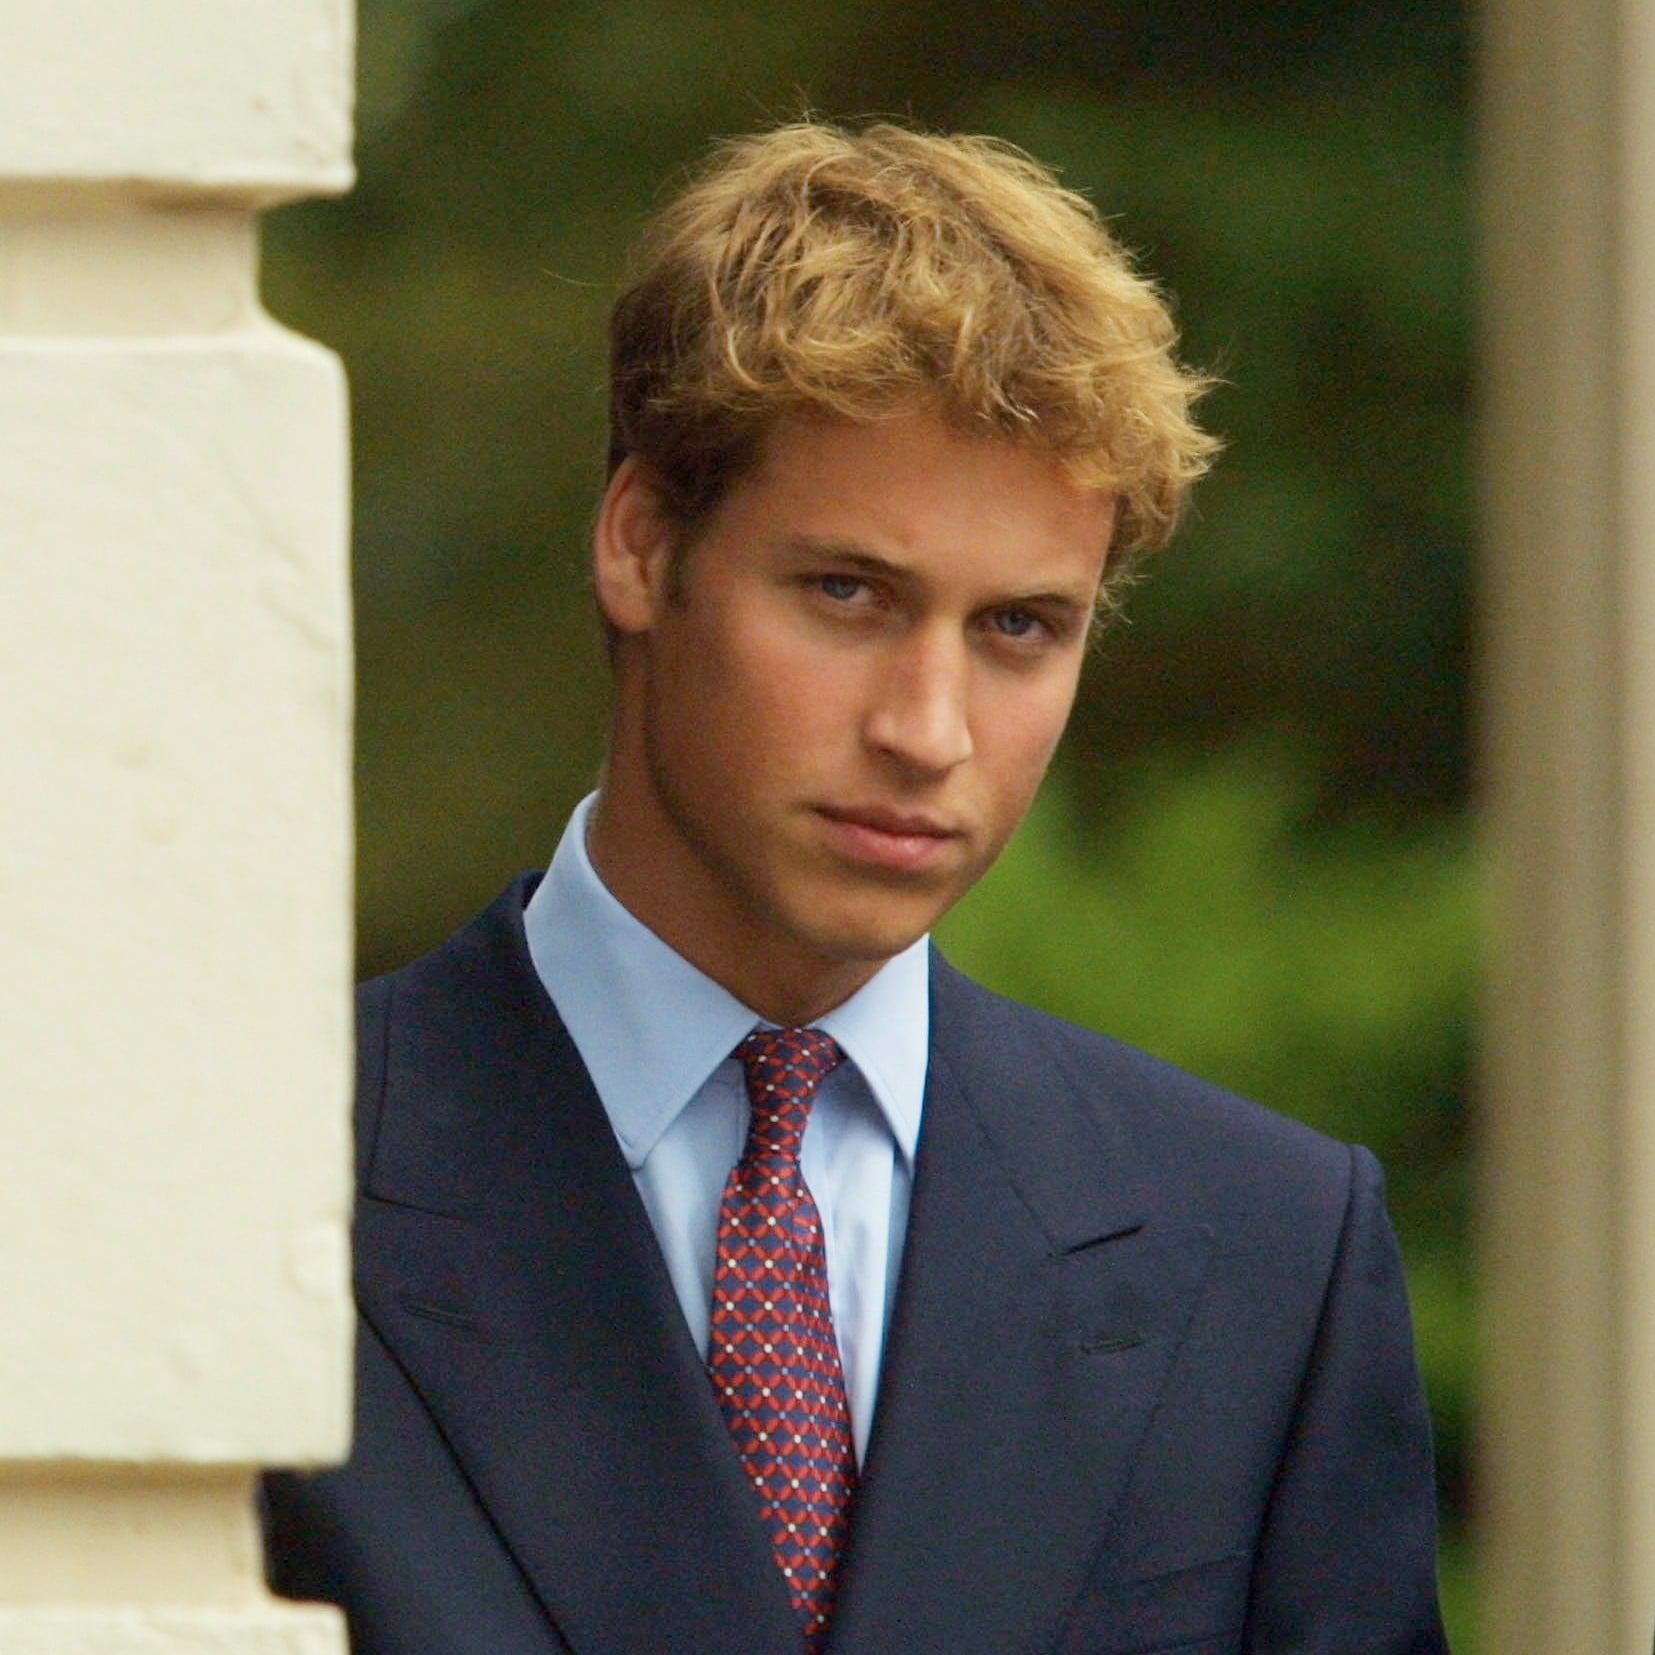 Was Prince William A Ladies Man?